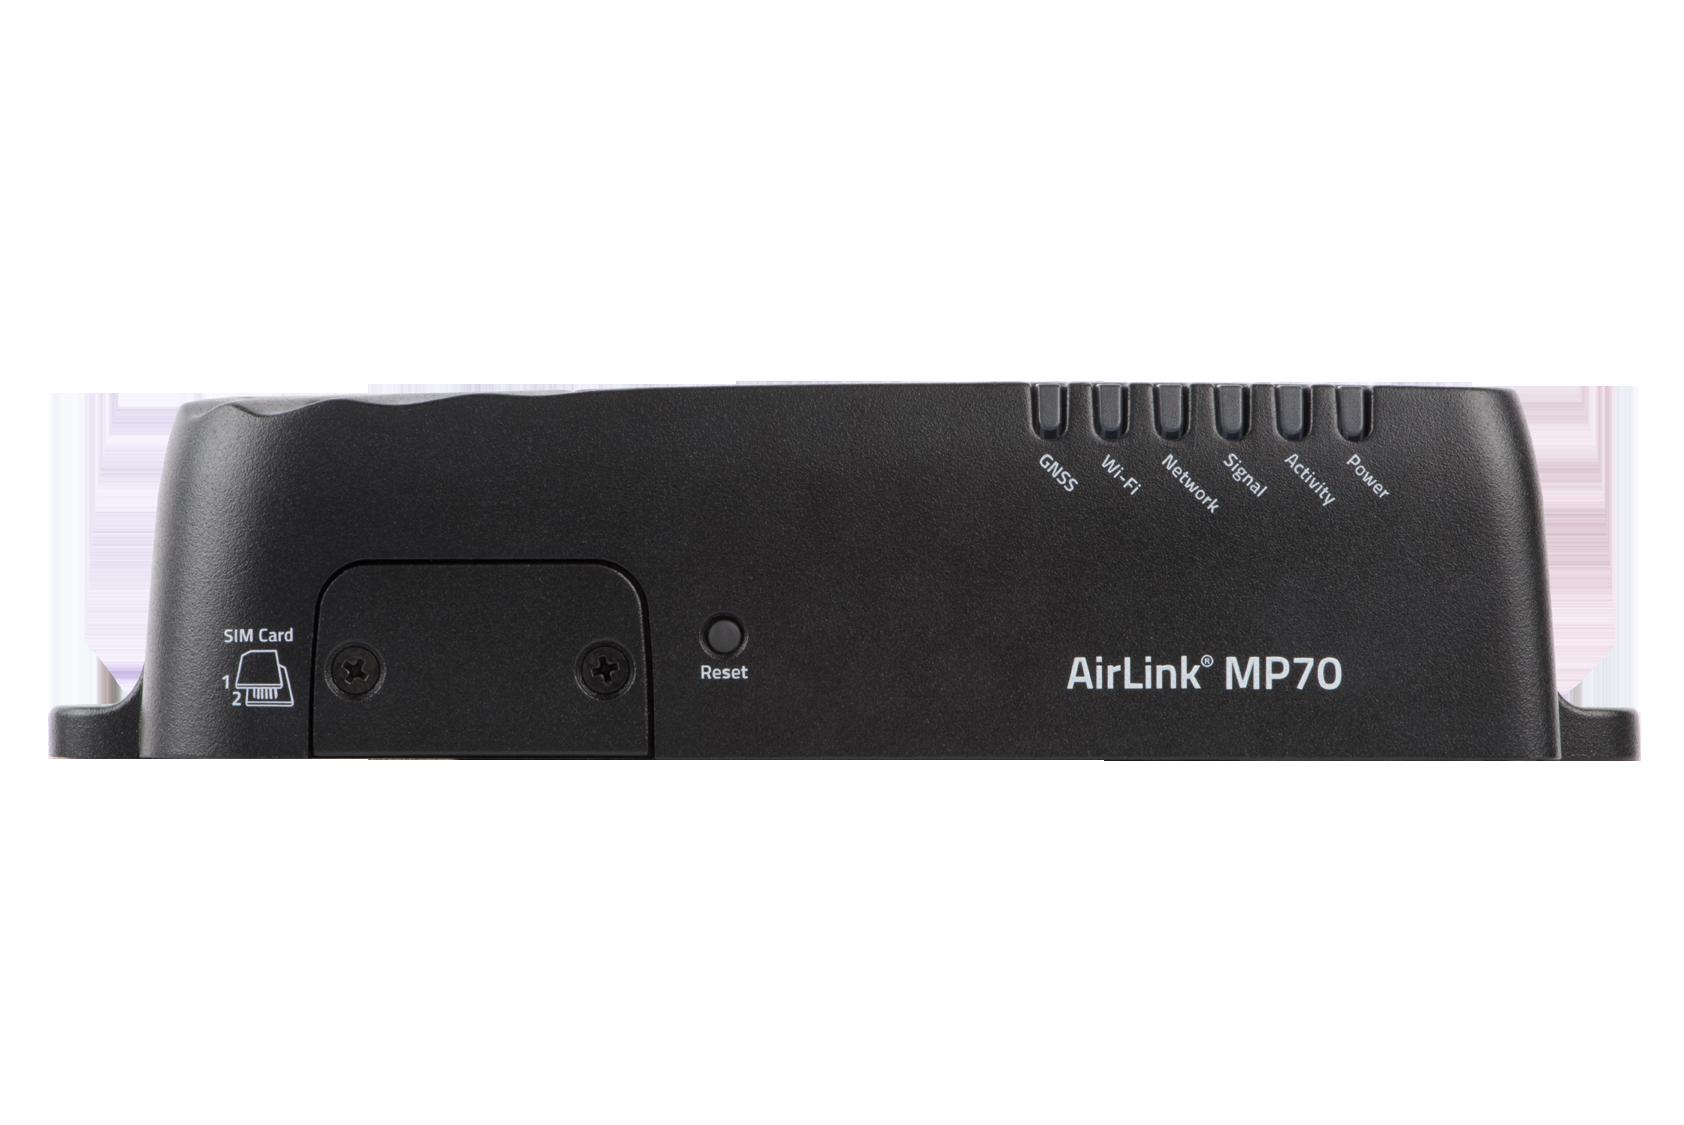 Sierra Wireless AirLink MP70